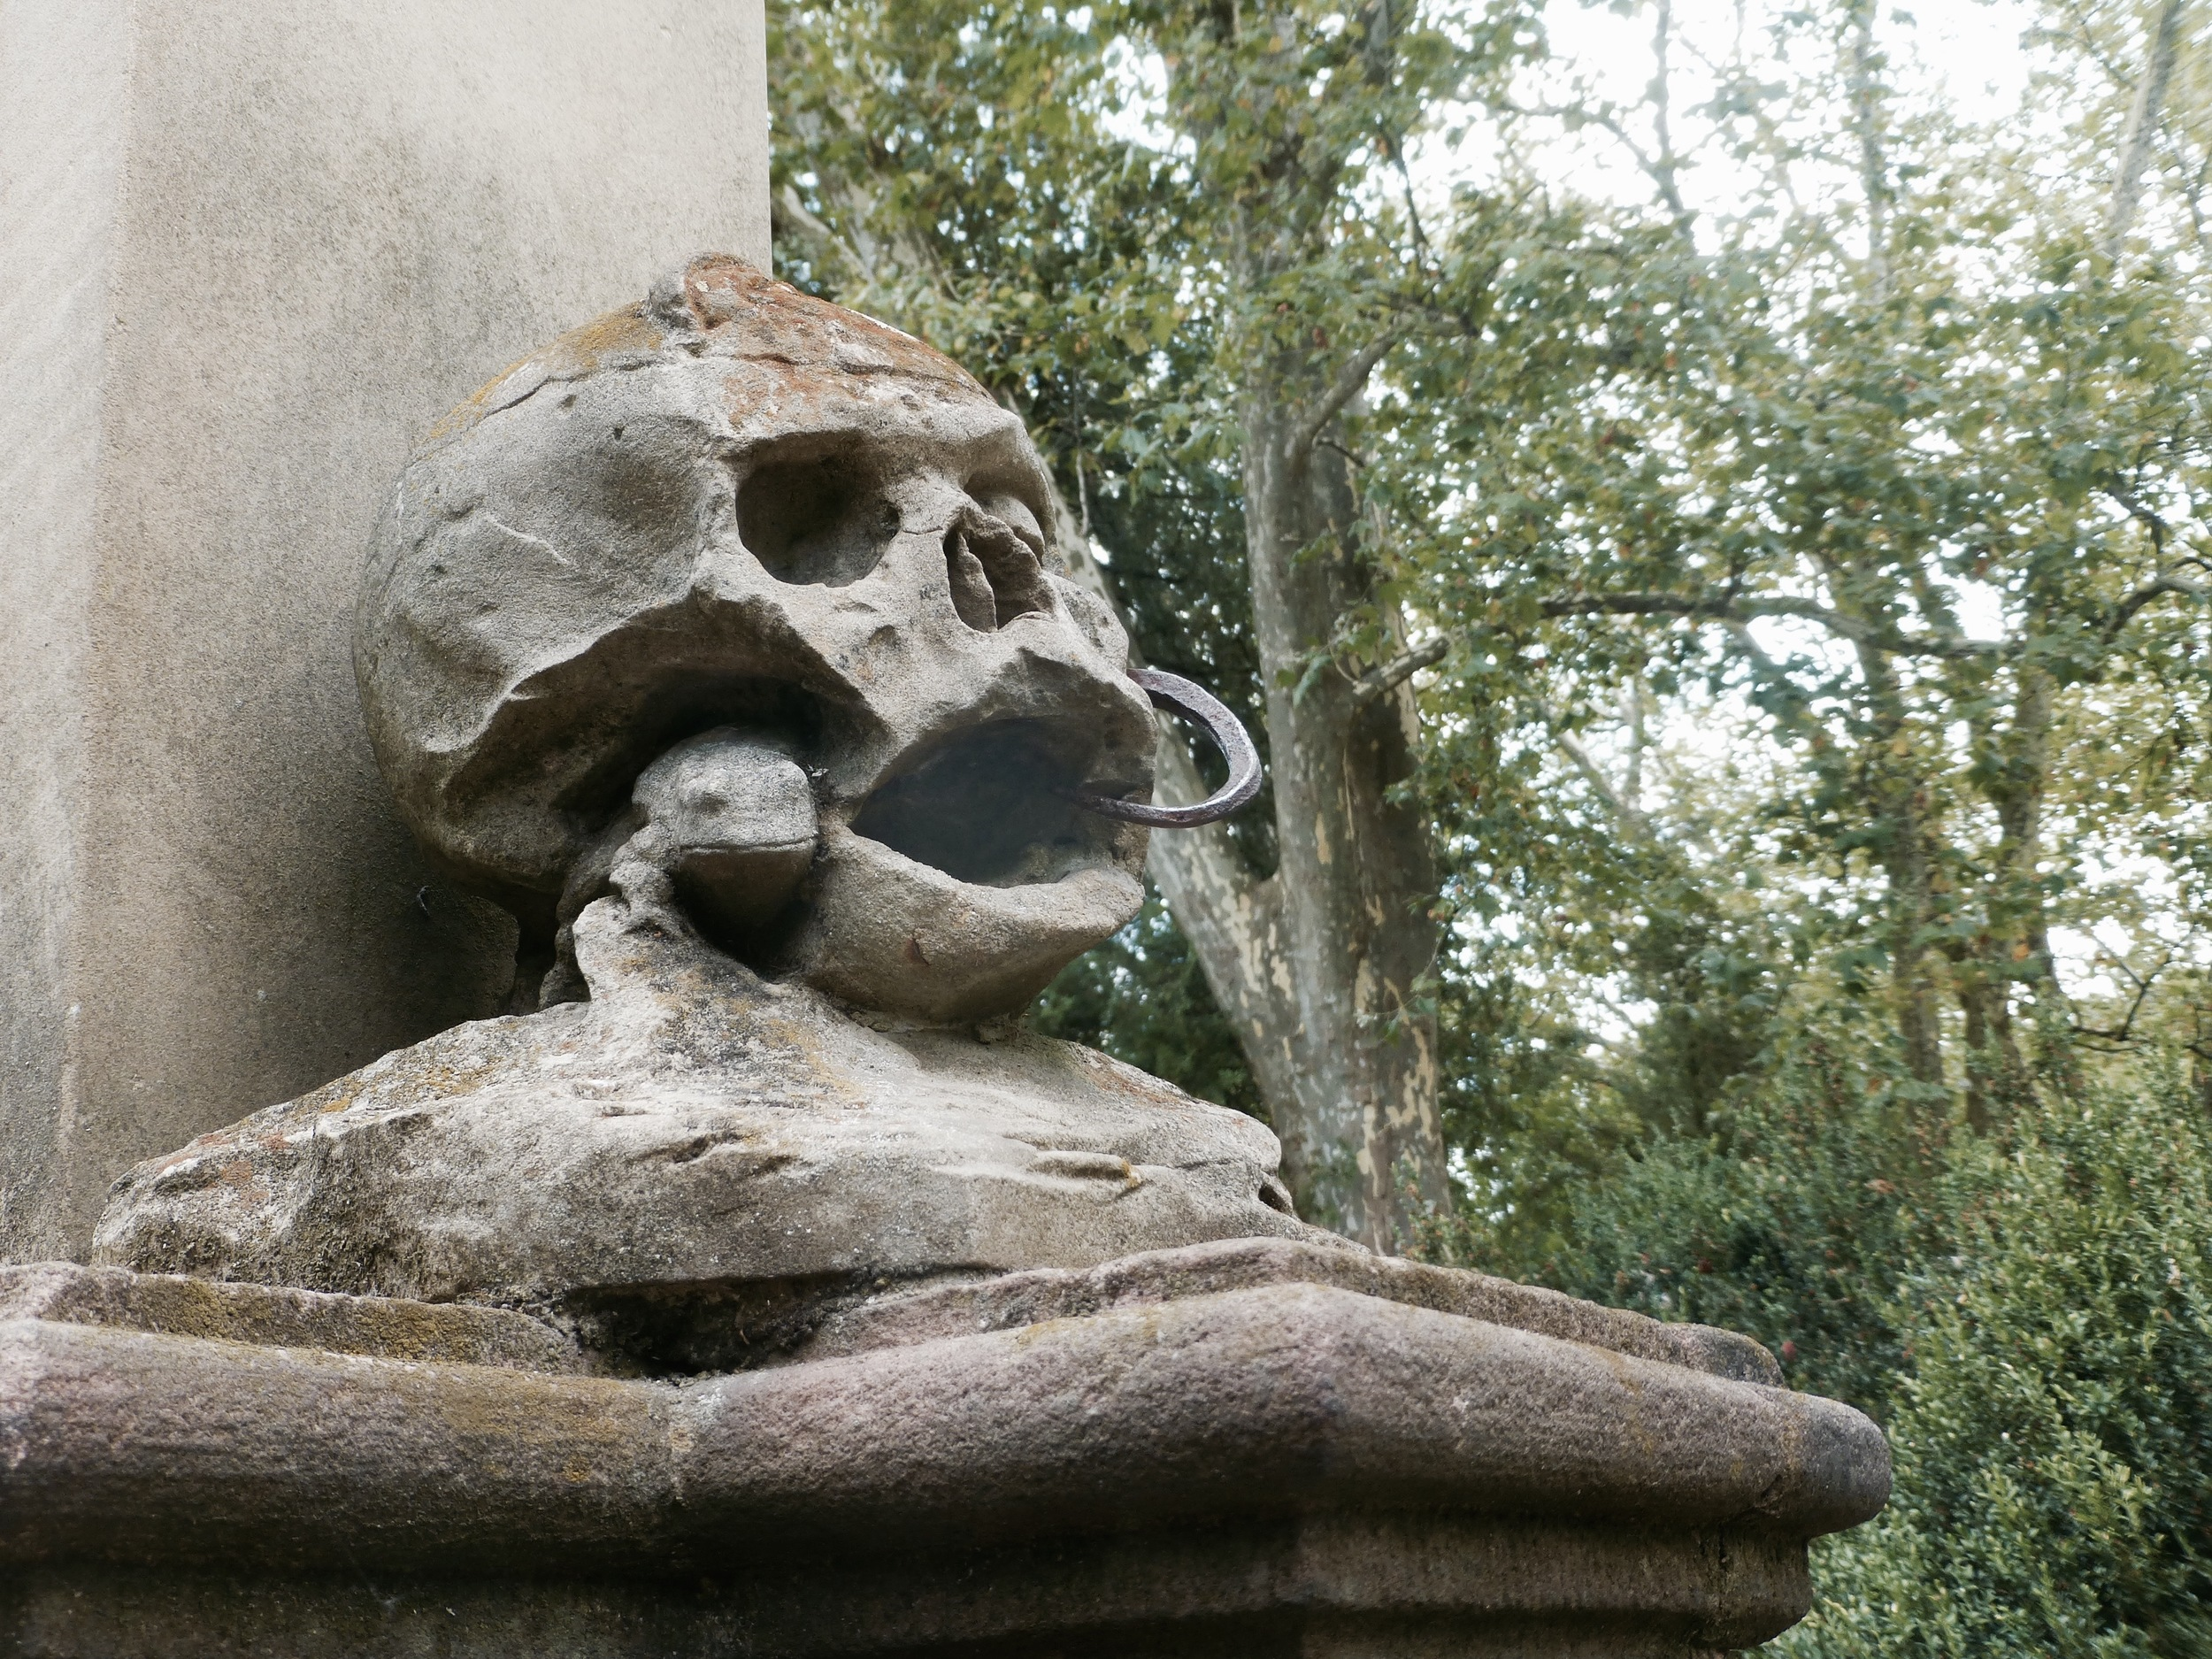 Blacksmith's Skull, Old Cemetery, Freiburg